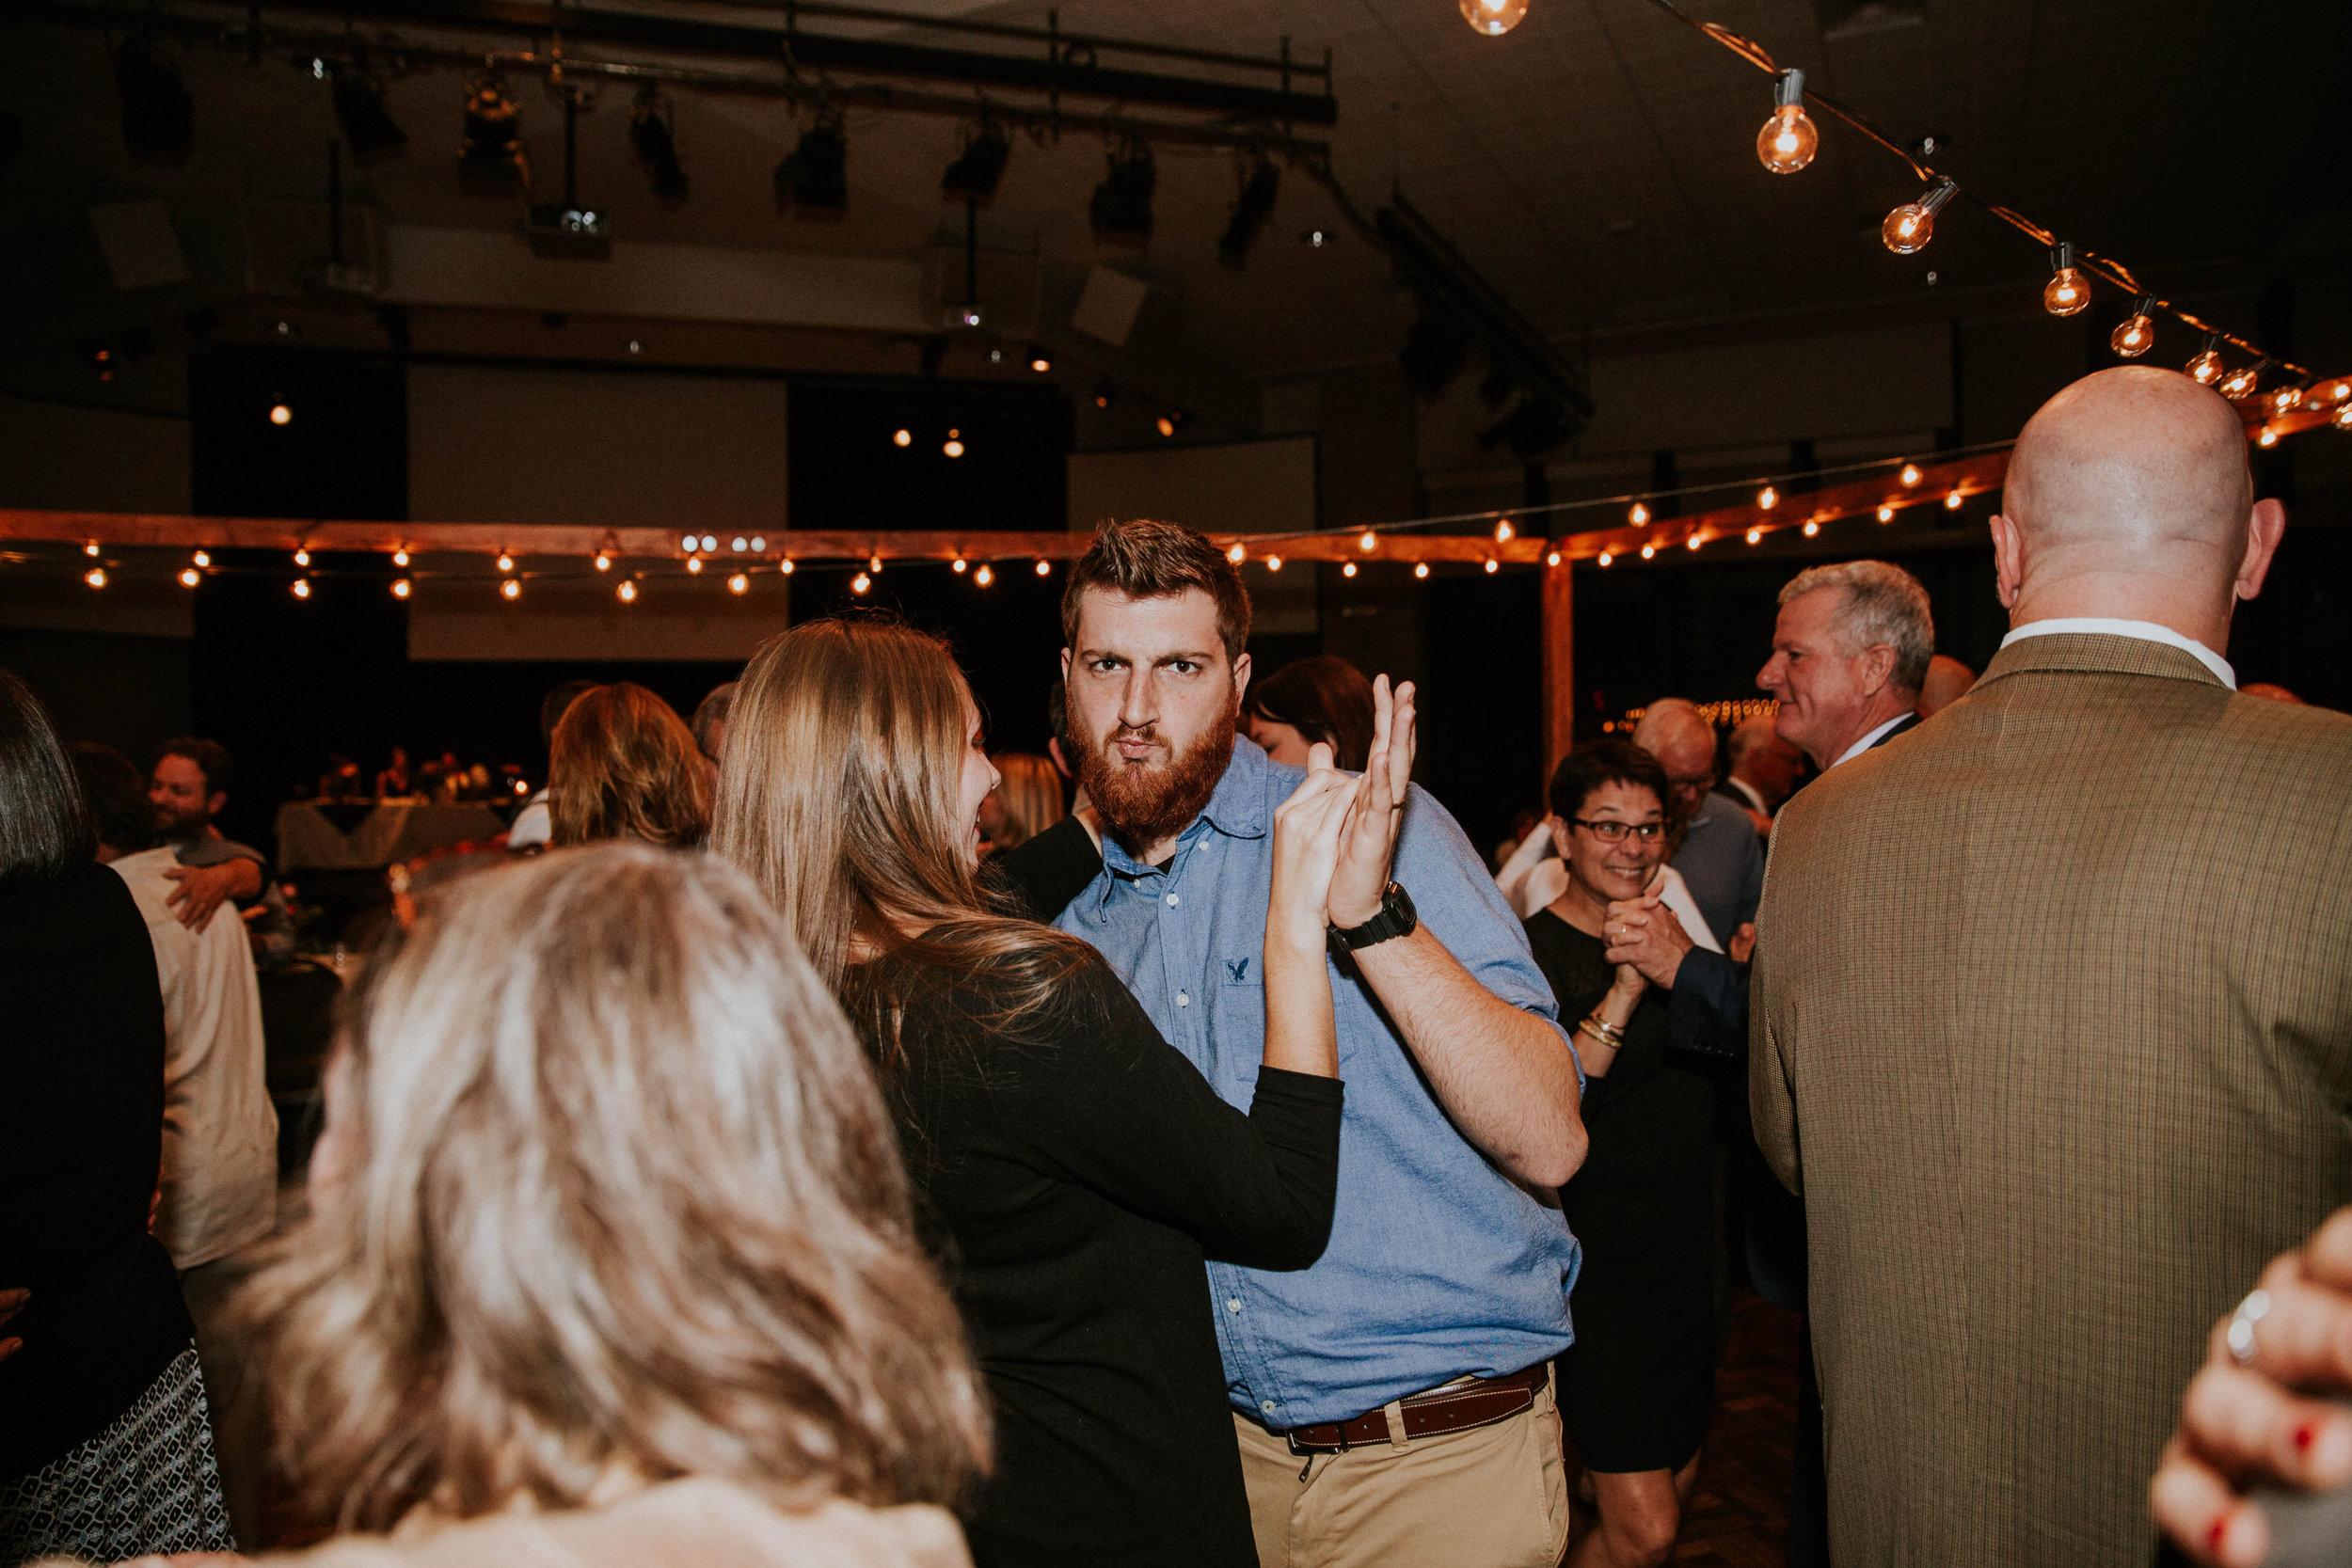 Columbus ohio wedding photographer grace e jones photography real fun joyful wedding143.jpg